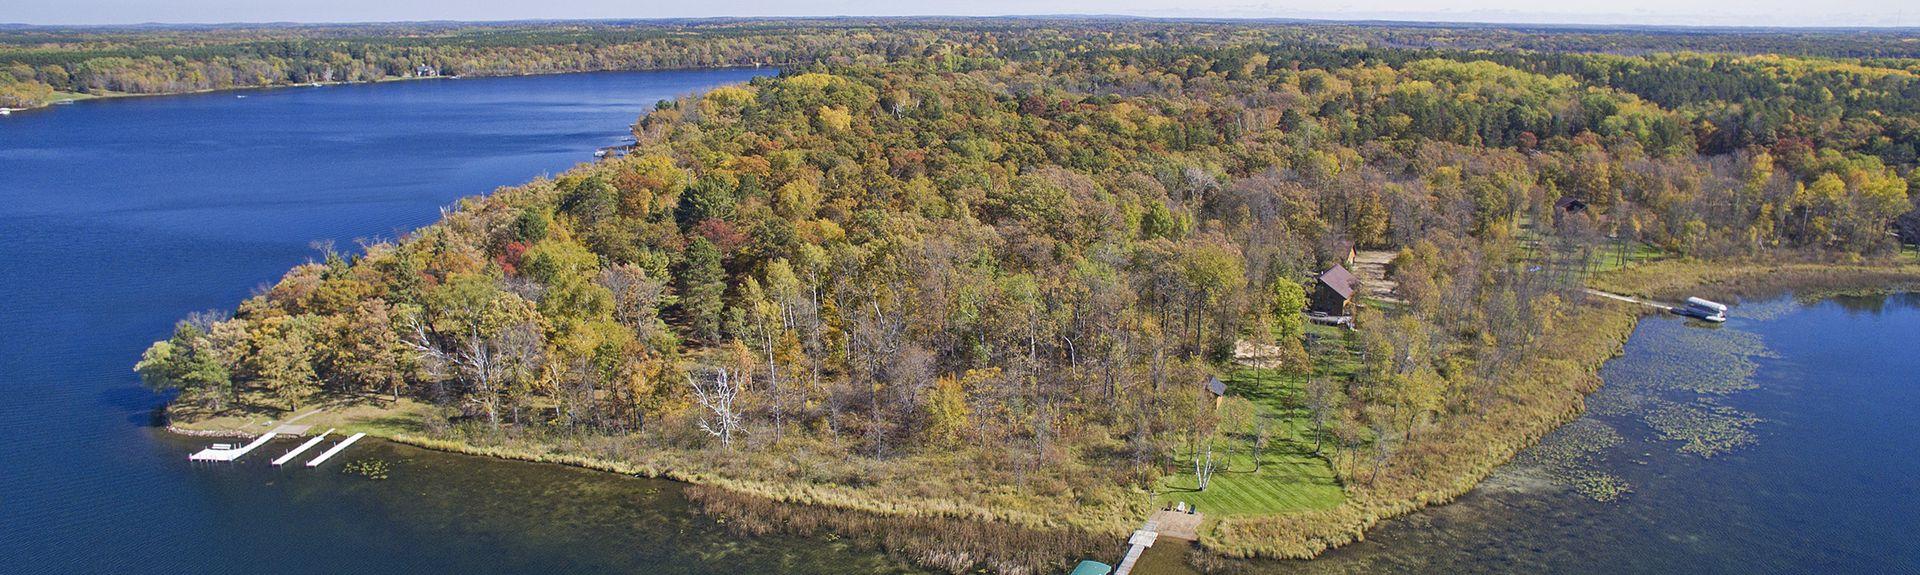 Lake Shore, Nisswa, Minnesota, United States of America